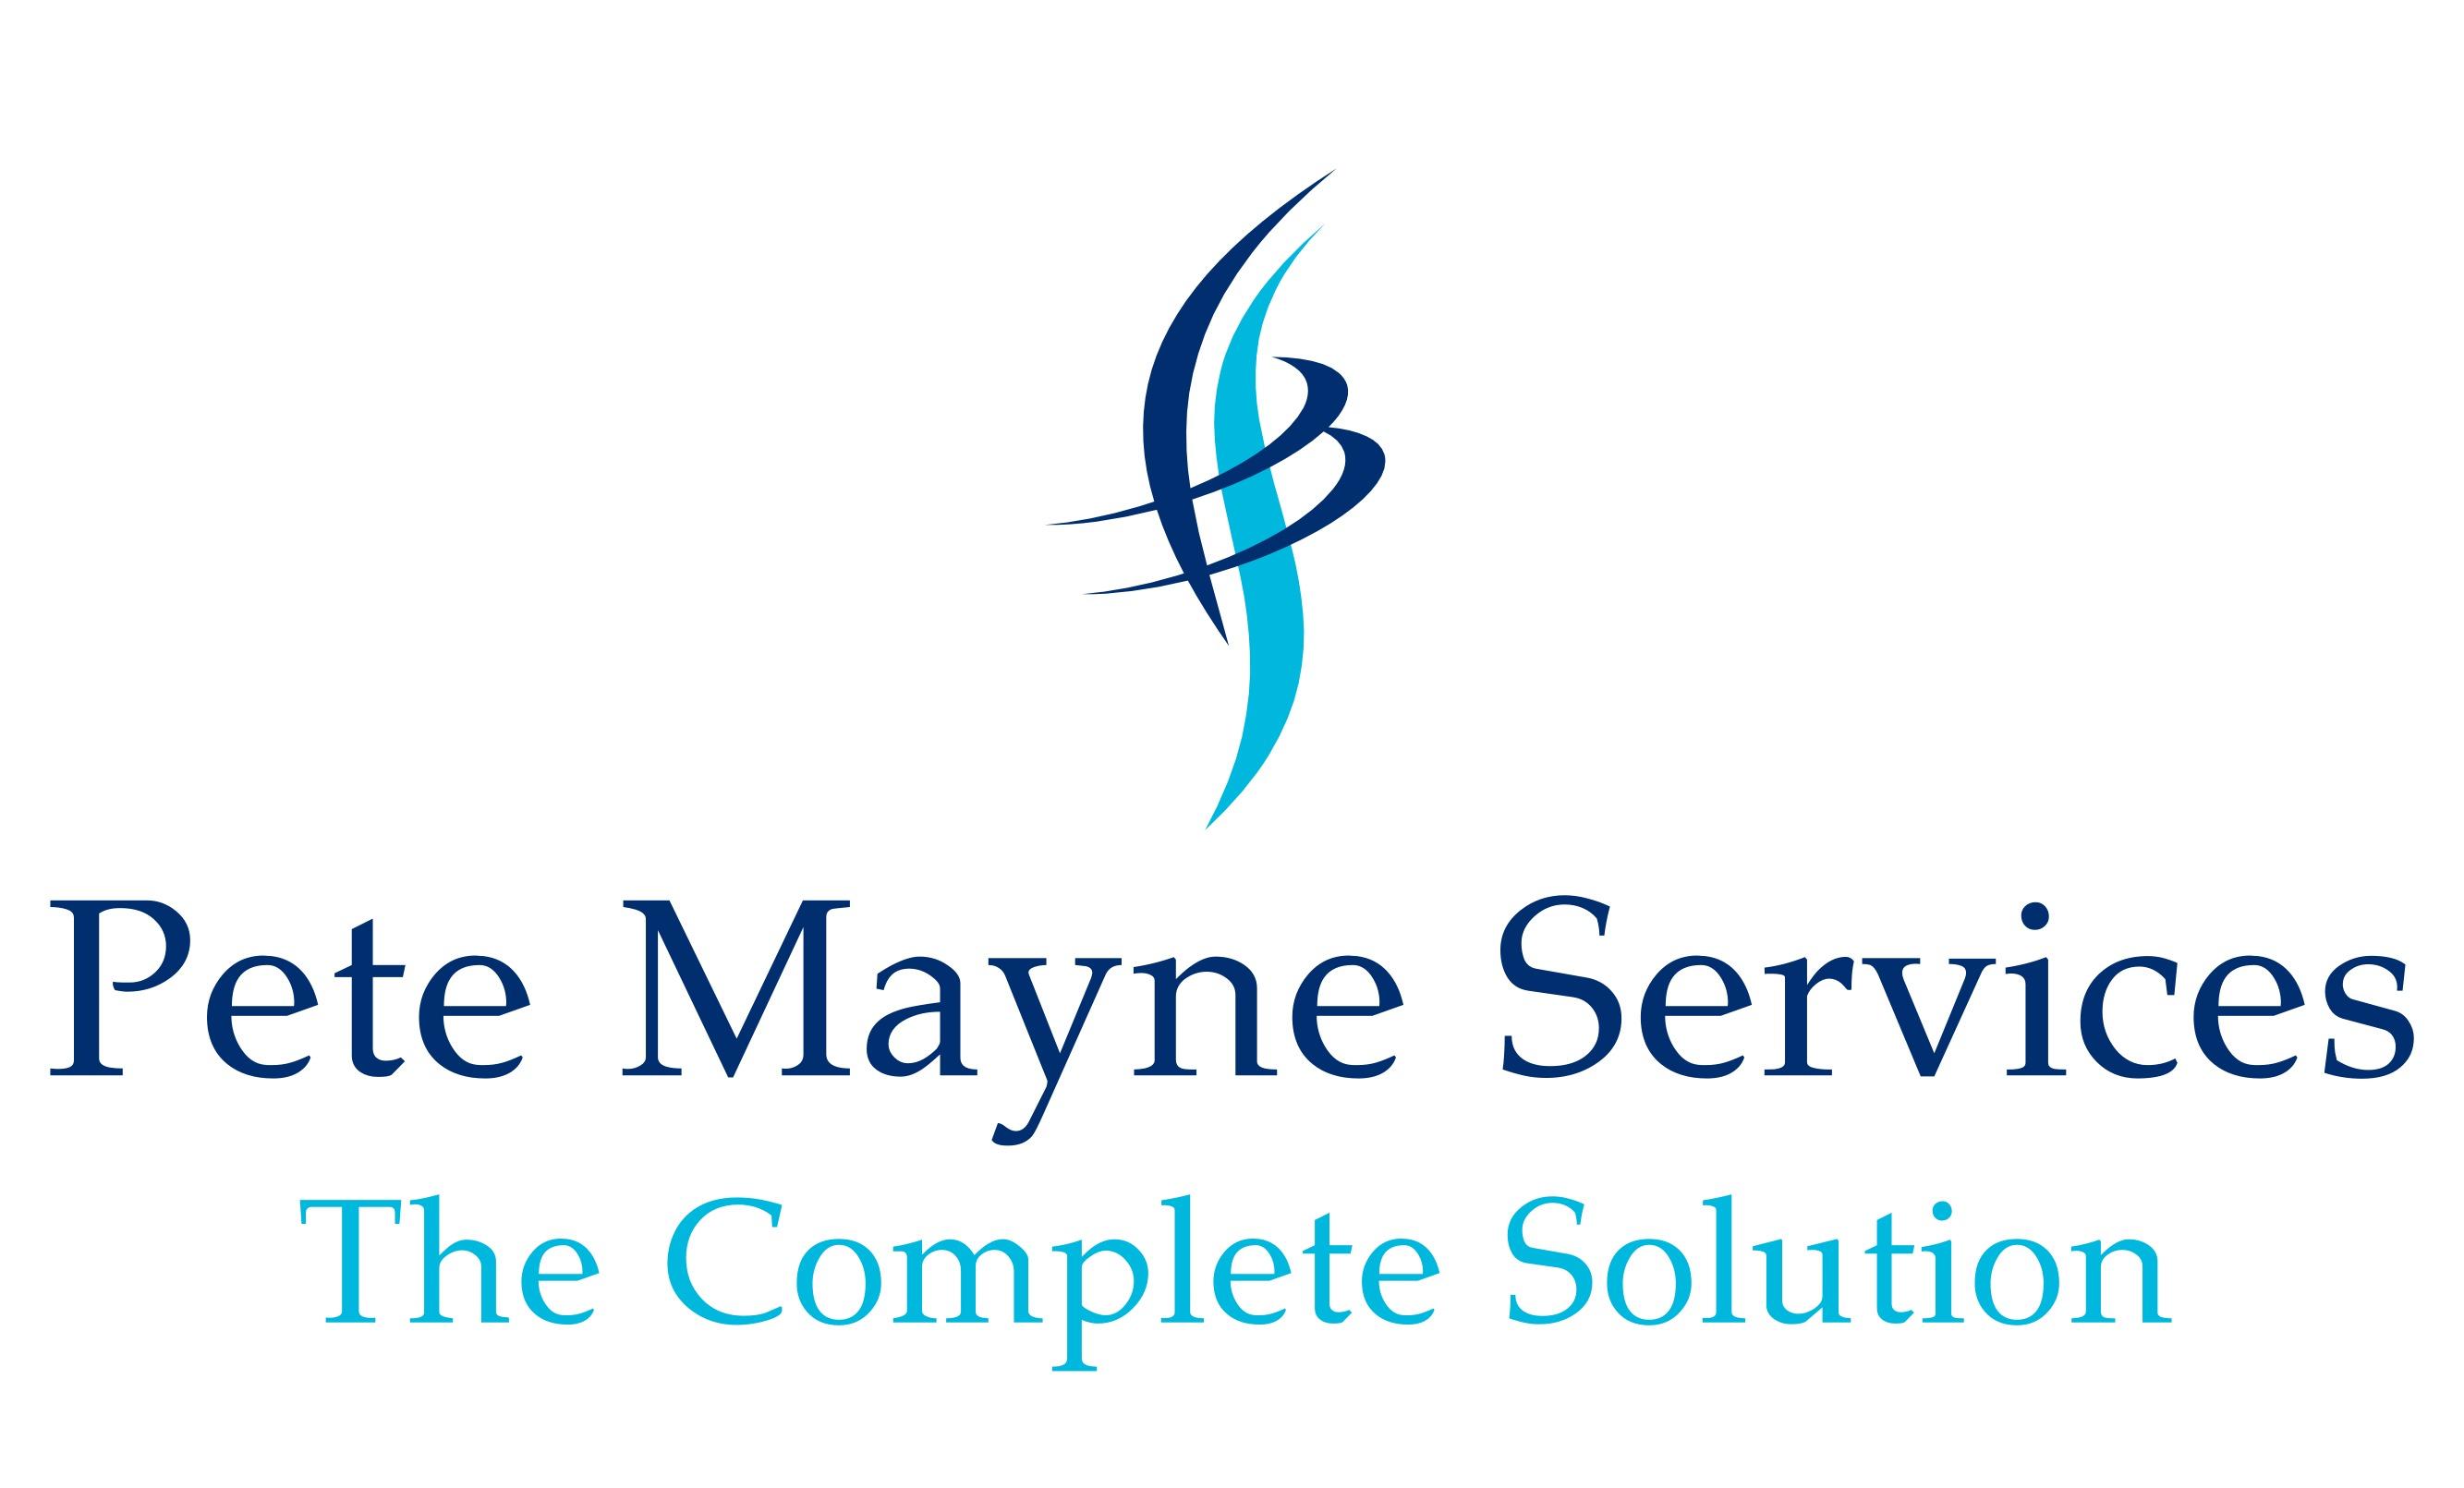 Pete Mayne Services Verified Logo